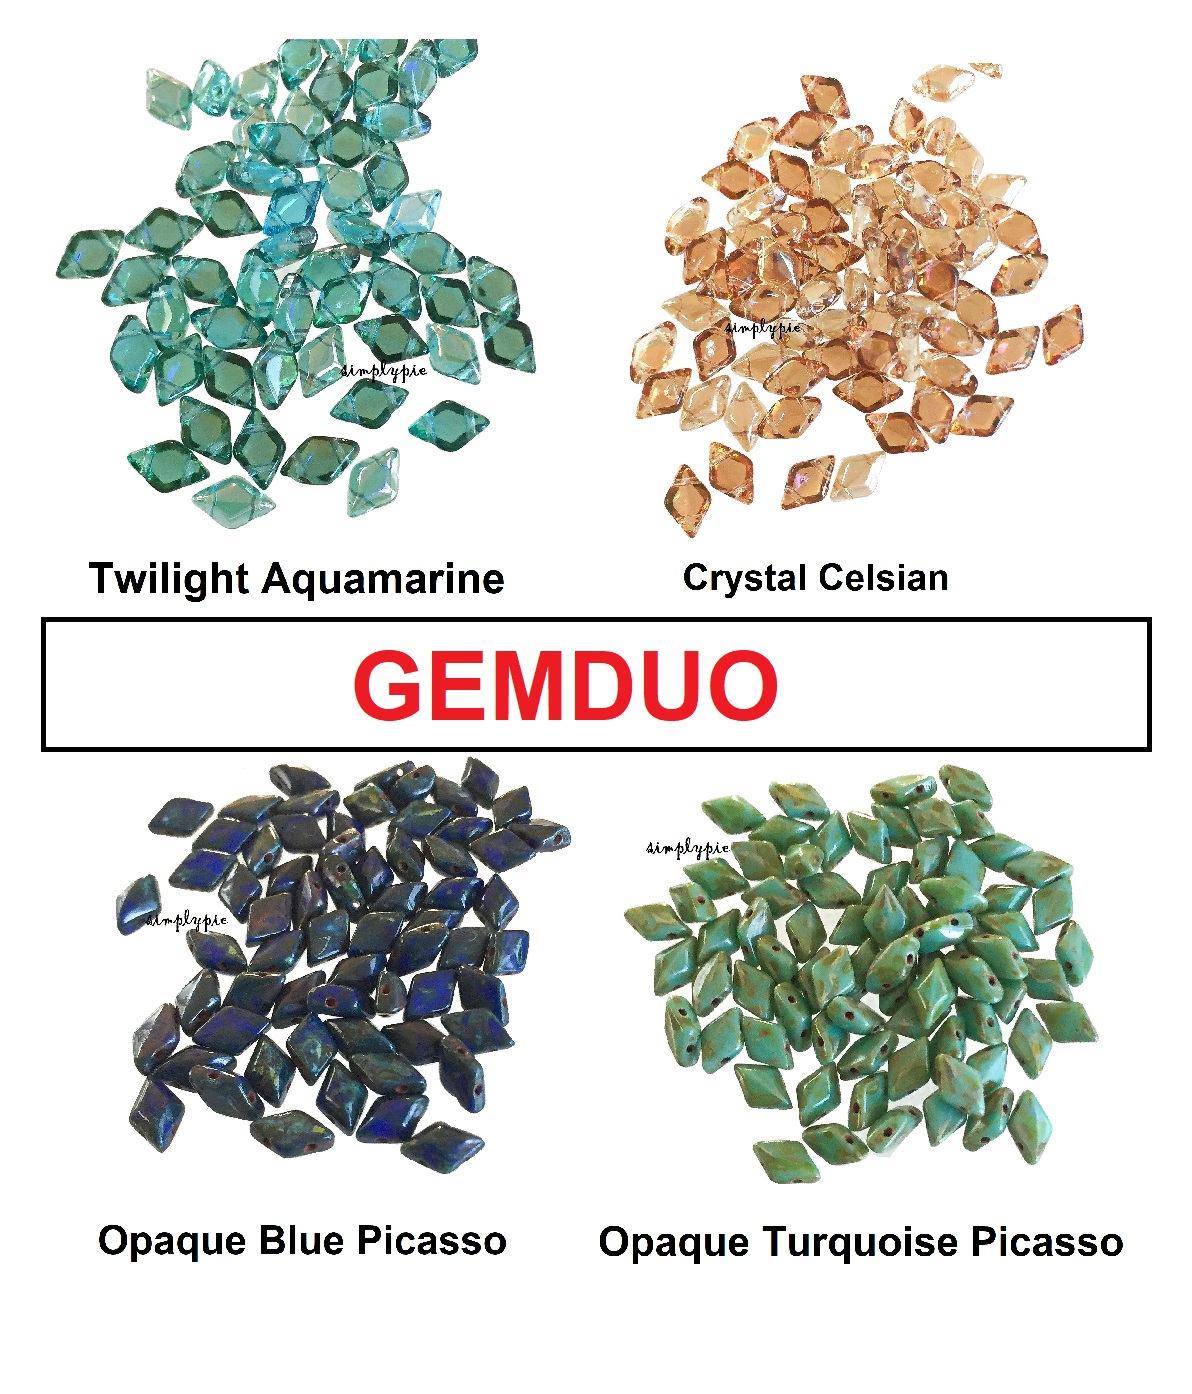 Apollo Gold 40 8 x 5 mm Czech Glass Gemduo Beads